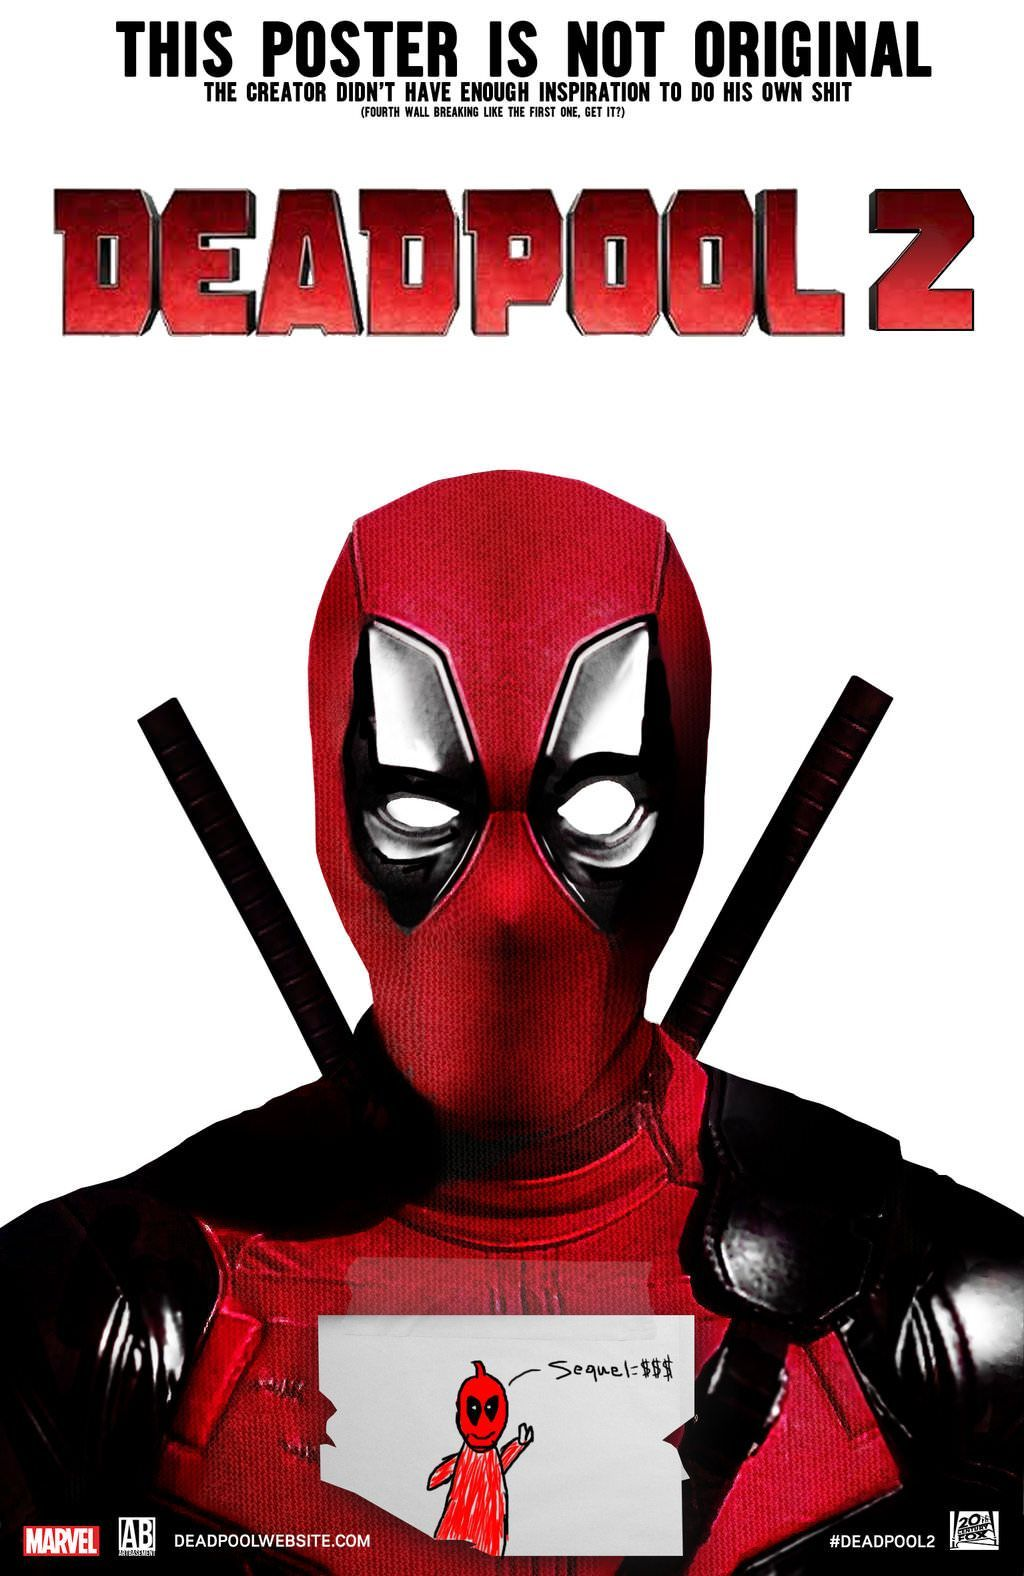 Film Deadpool 2 Streaming Vf : deadpool, streaming, Deadpool, Movie, Watch, Online, (2018), Movies, Free,, Movies,